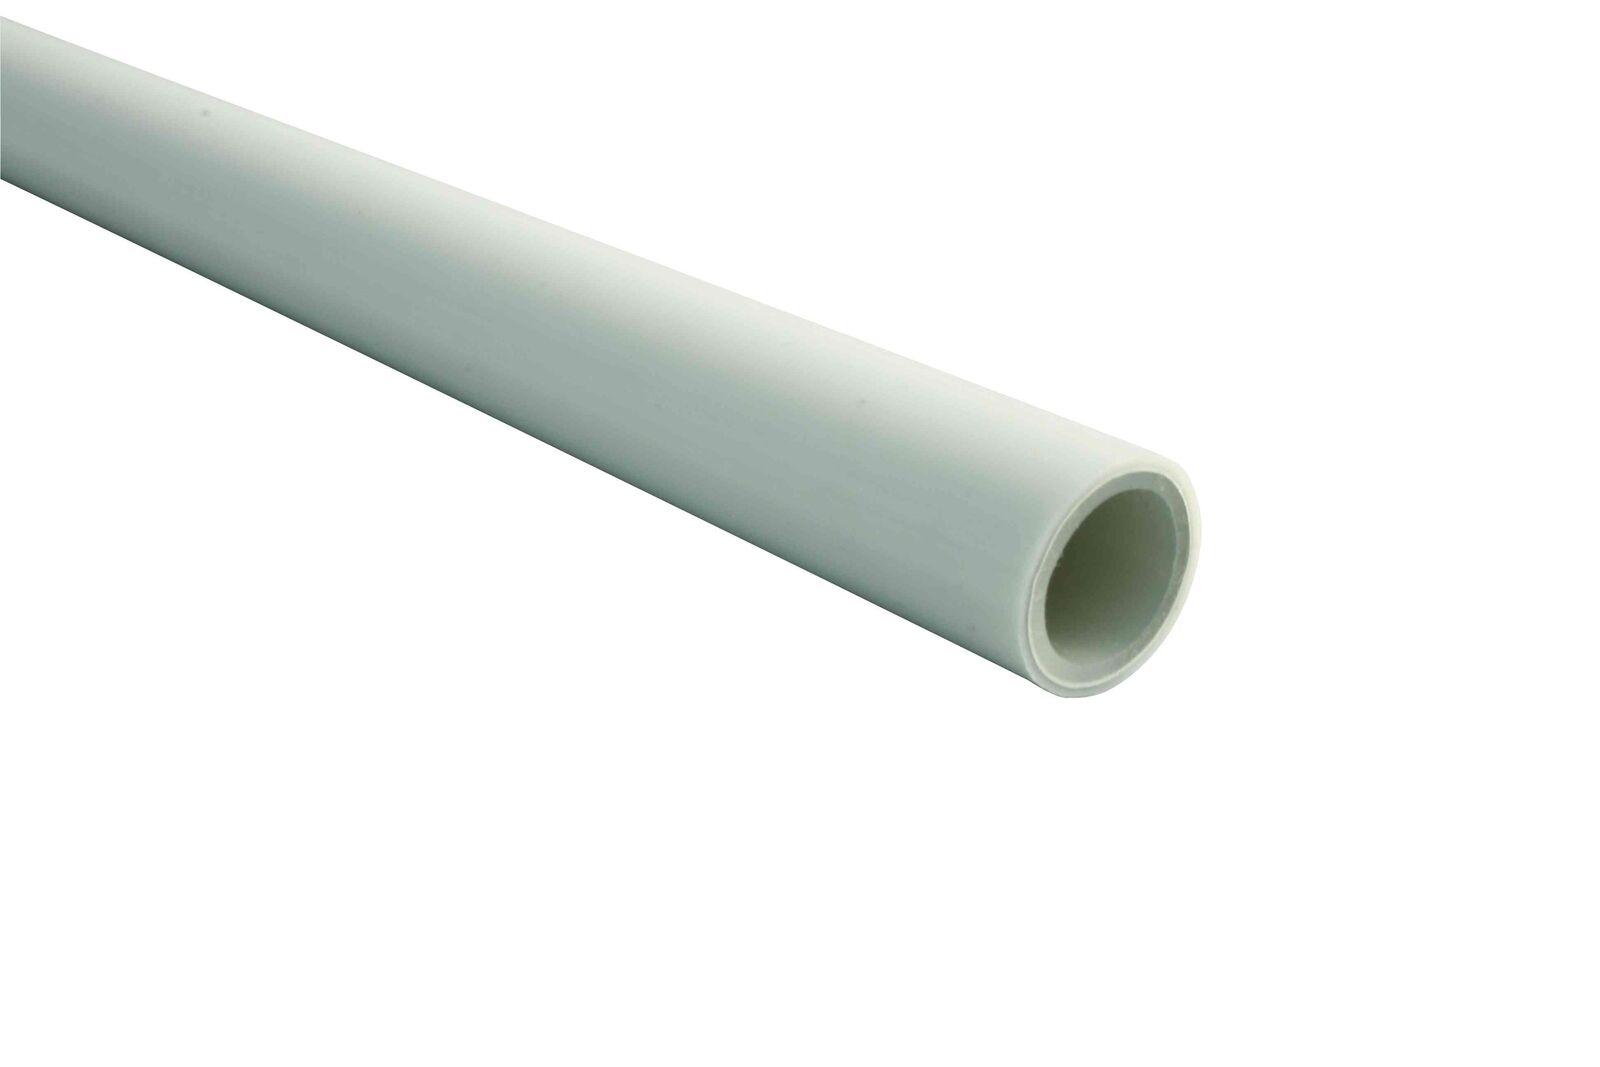 Marley PE-Alu-Verbundrohr AquaStec - 25 m, Ø 20 mm